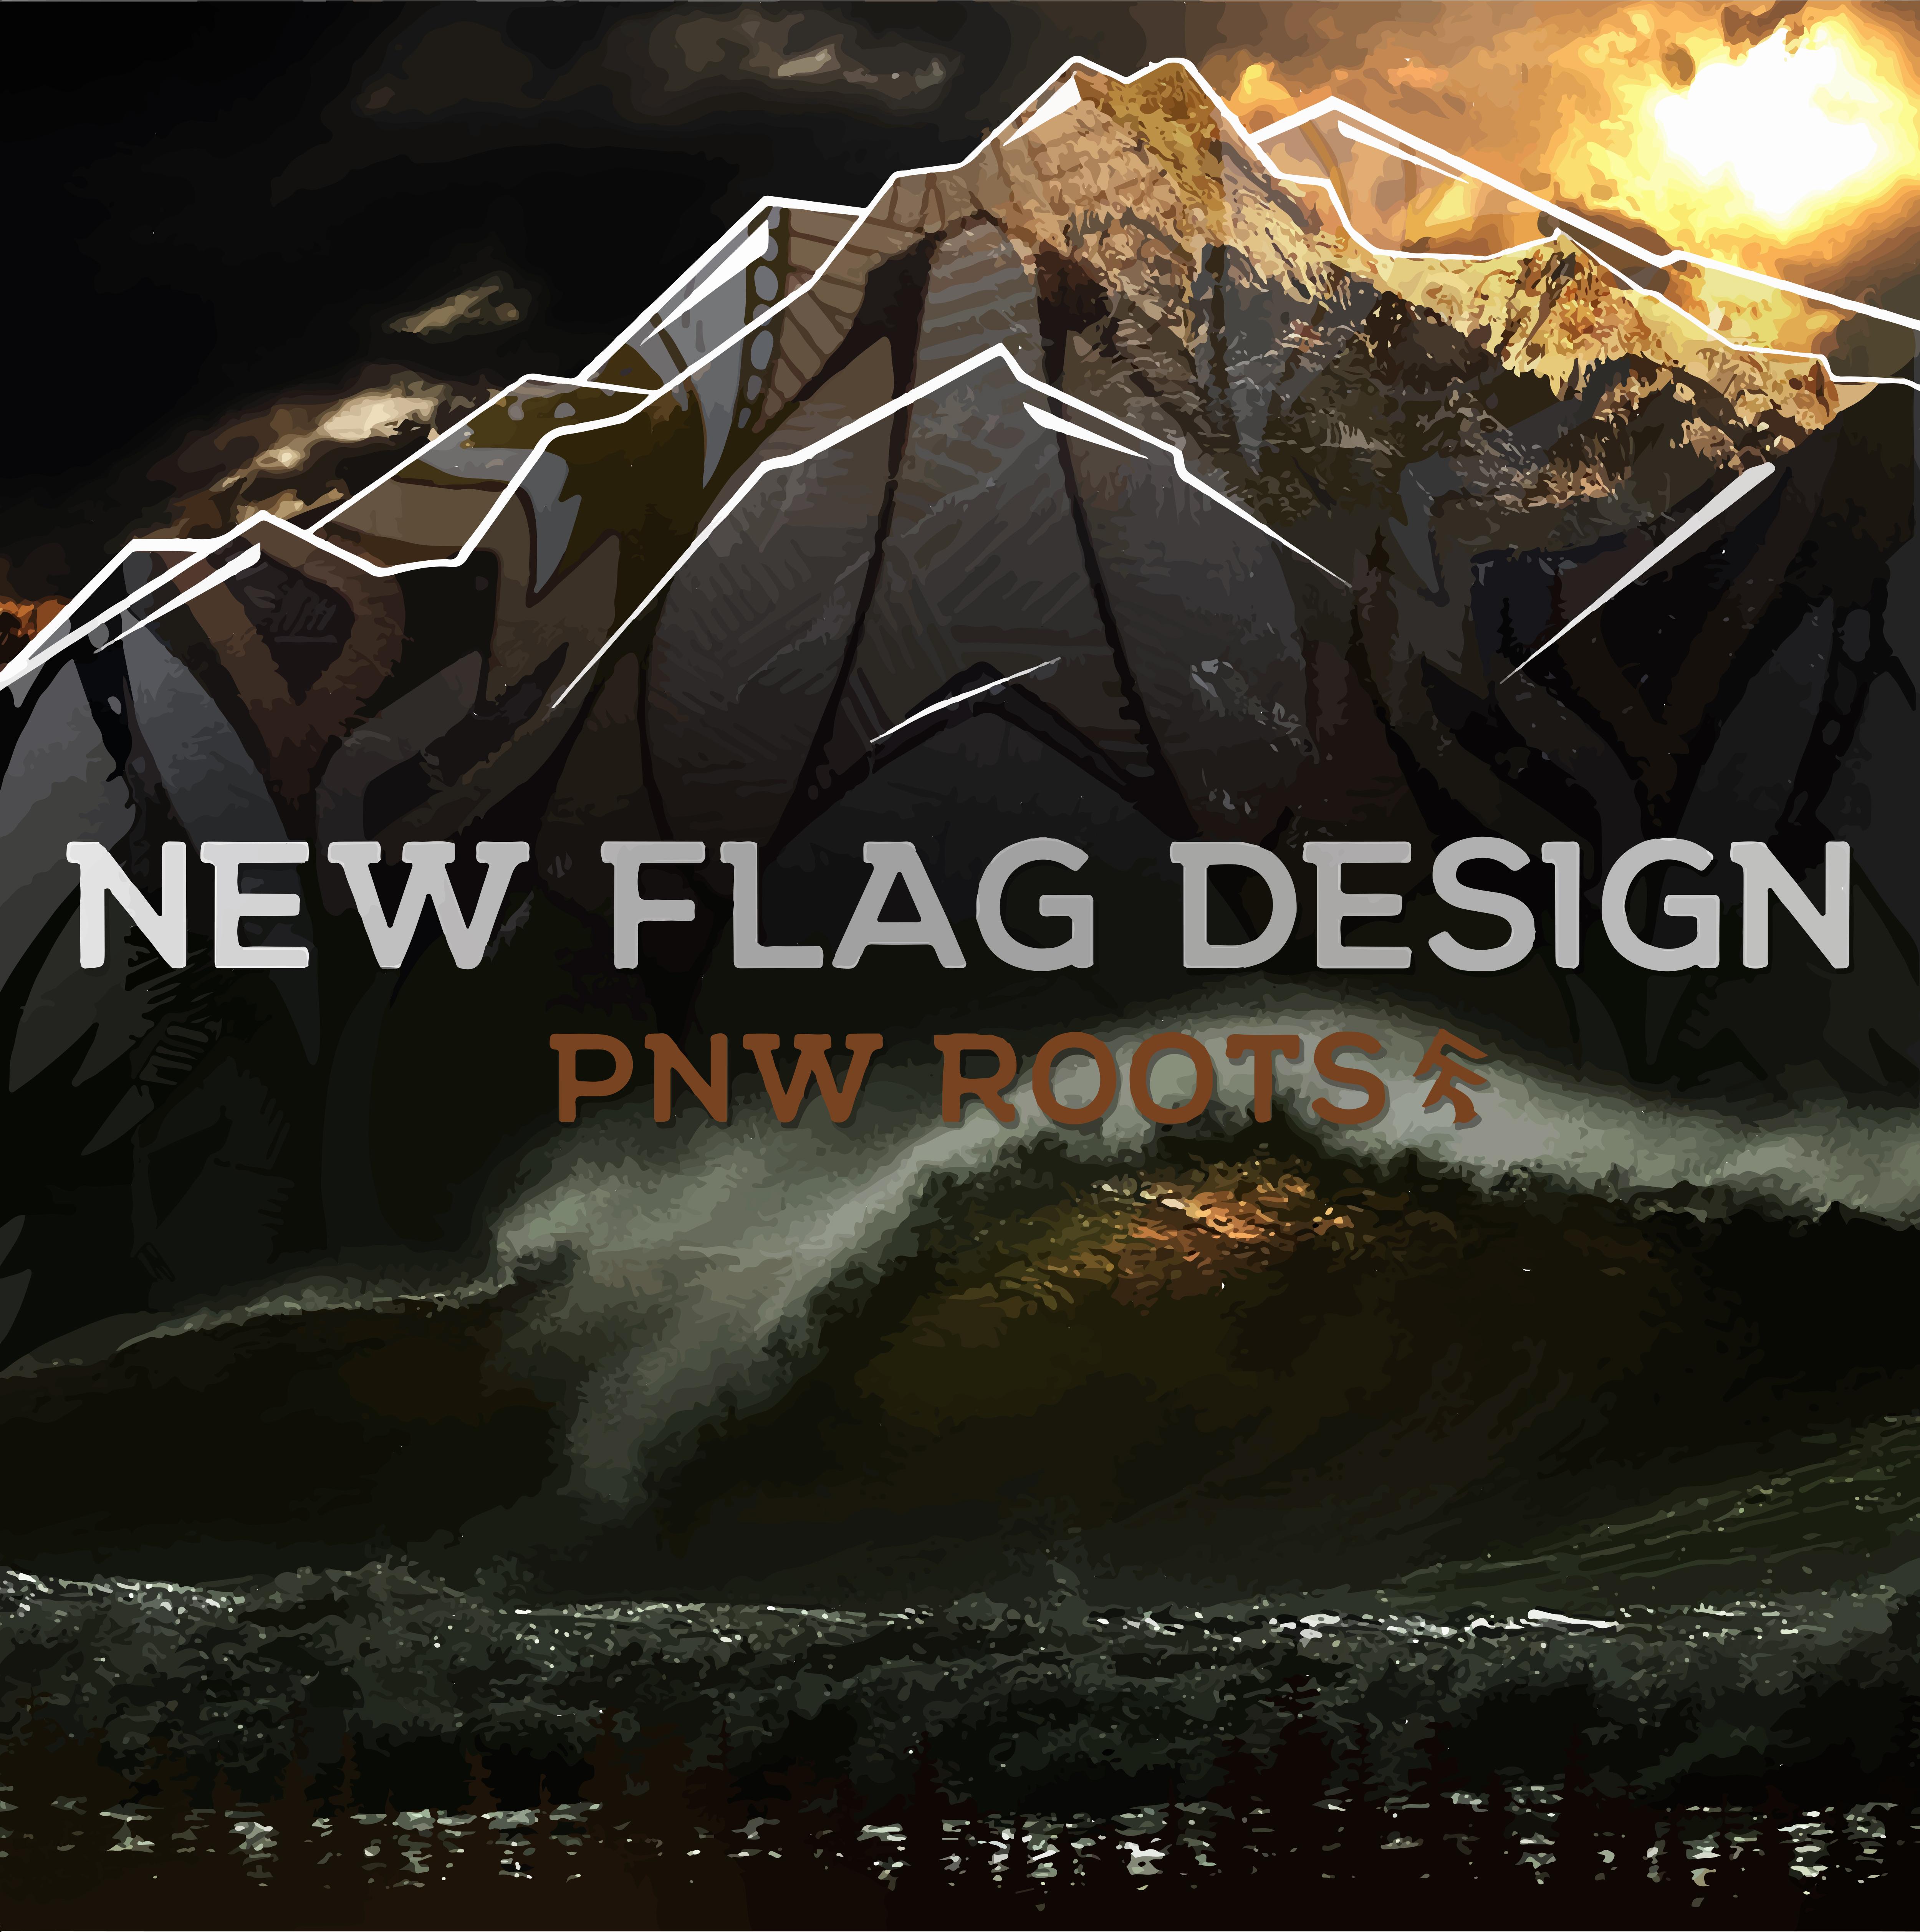 NEW FLAG DESIGN PNW ROOTS